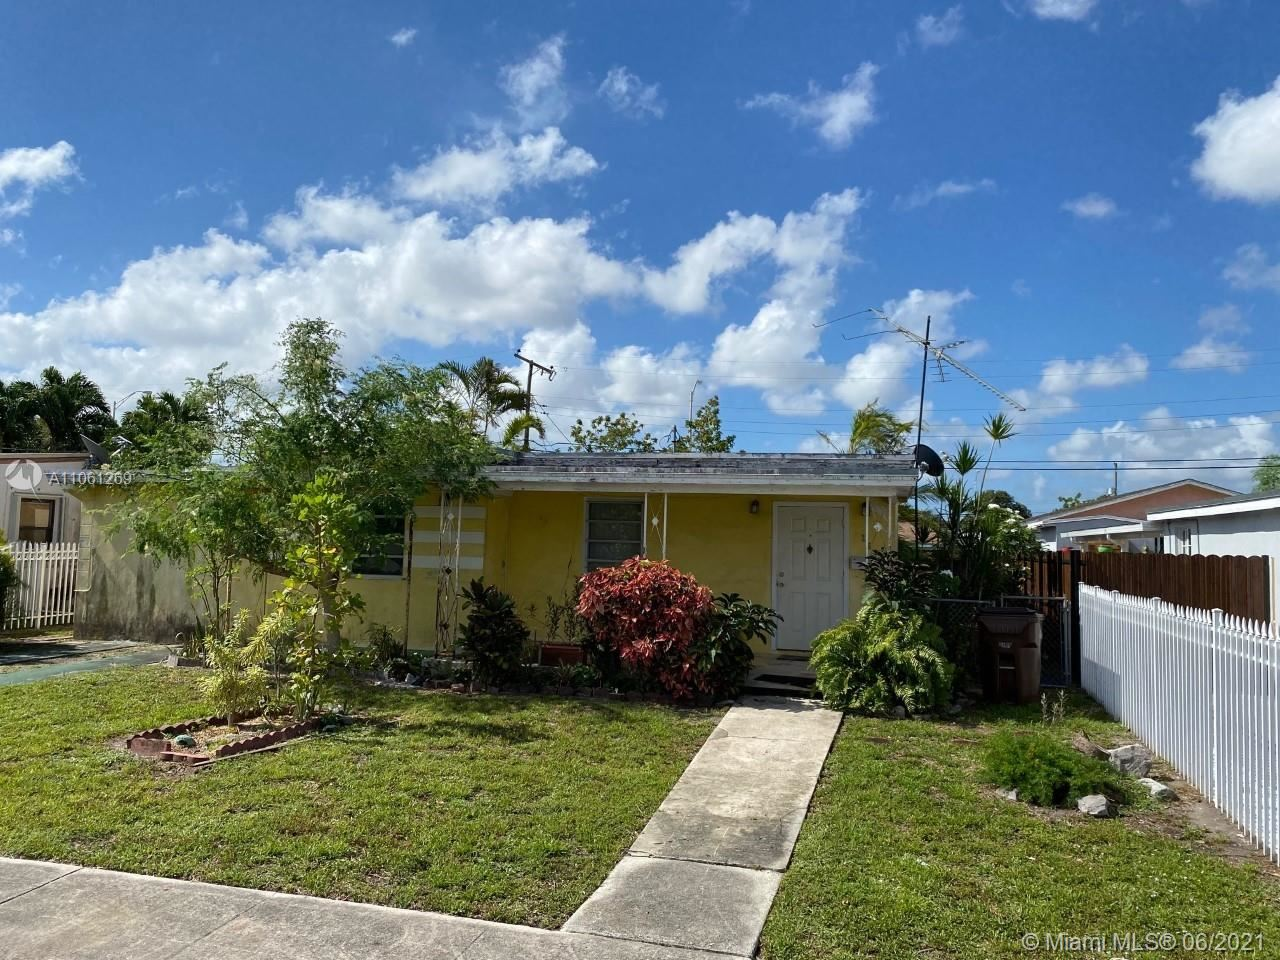 Photo of 266 W 38th St, Hialeah, FL 33012 (MLS # A11061269)